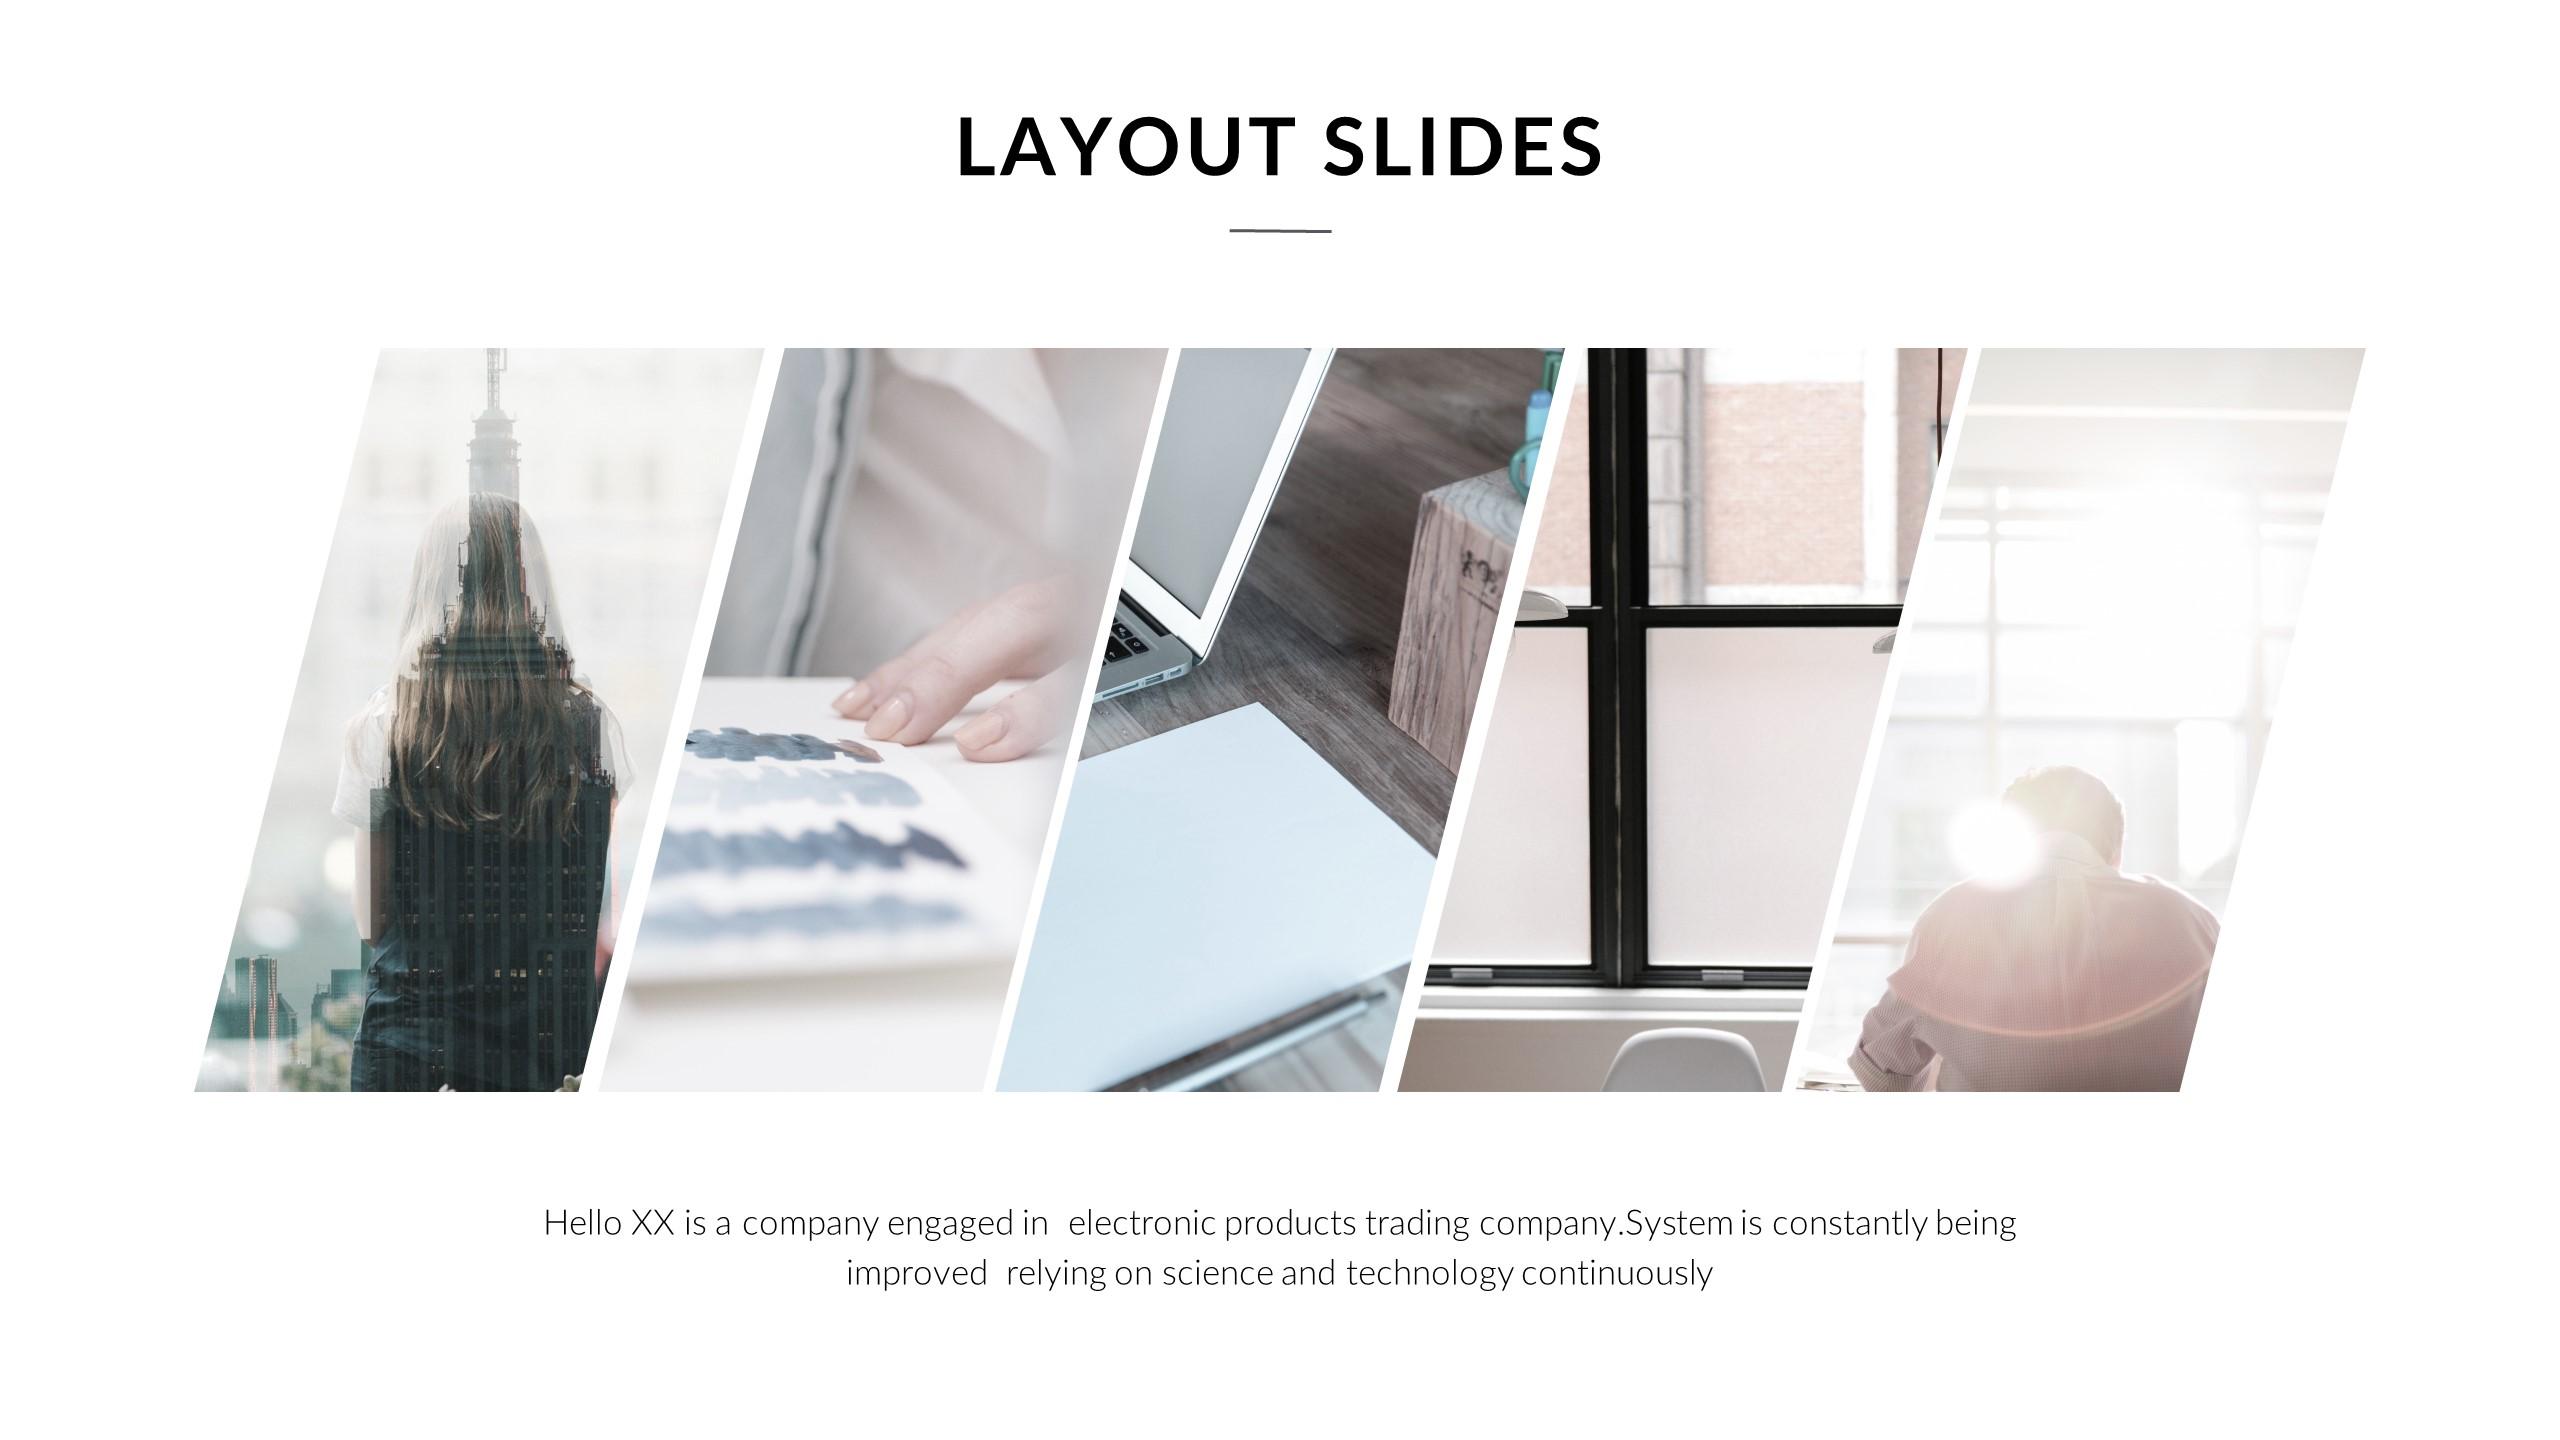 Modern powerpoint template by 5yue graphicriver jpg 009modern ppt p009ppt 15 toneelgroepblik Gallery